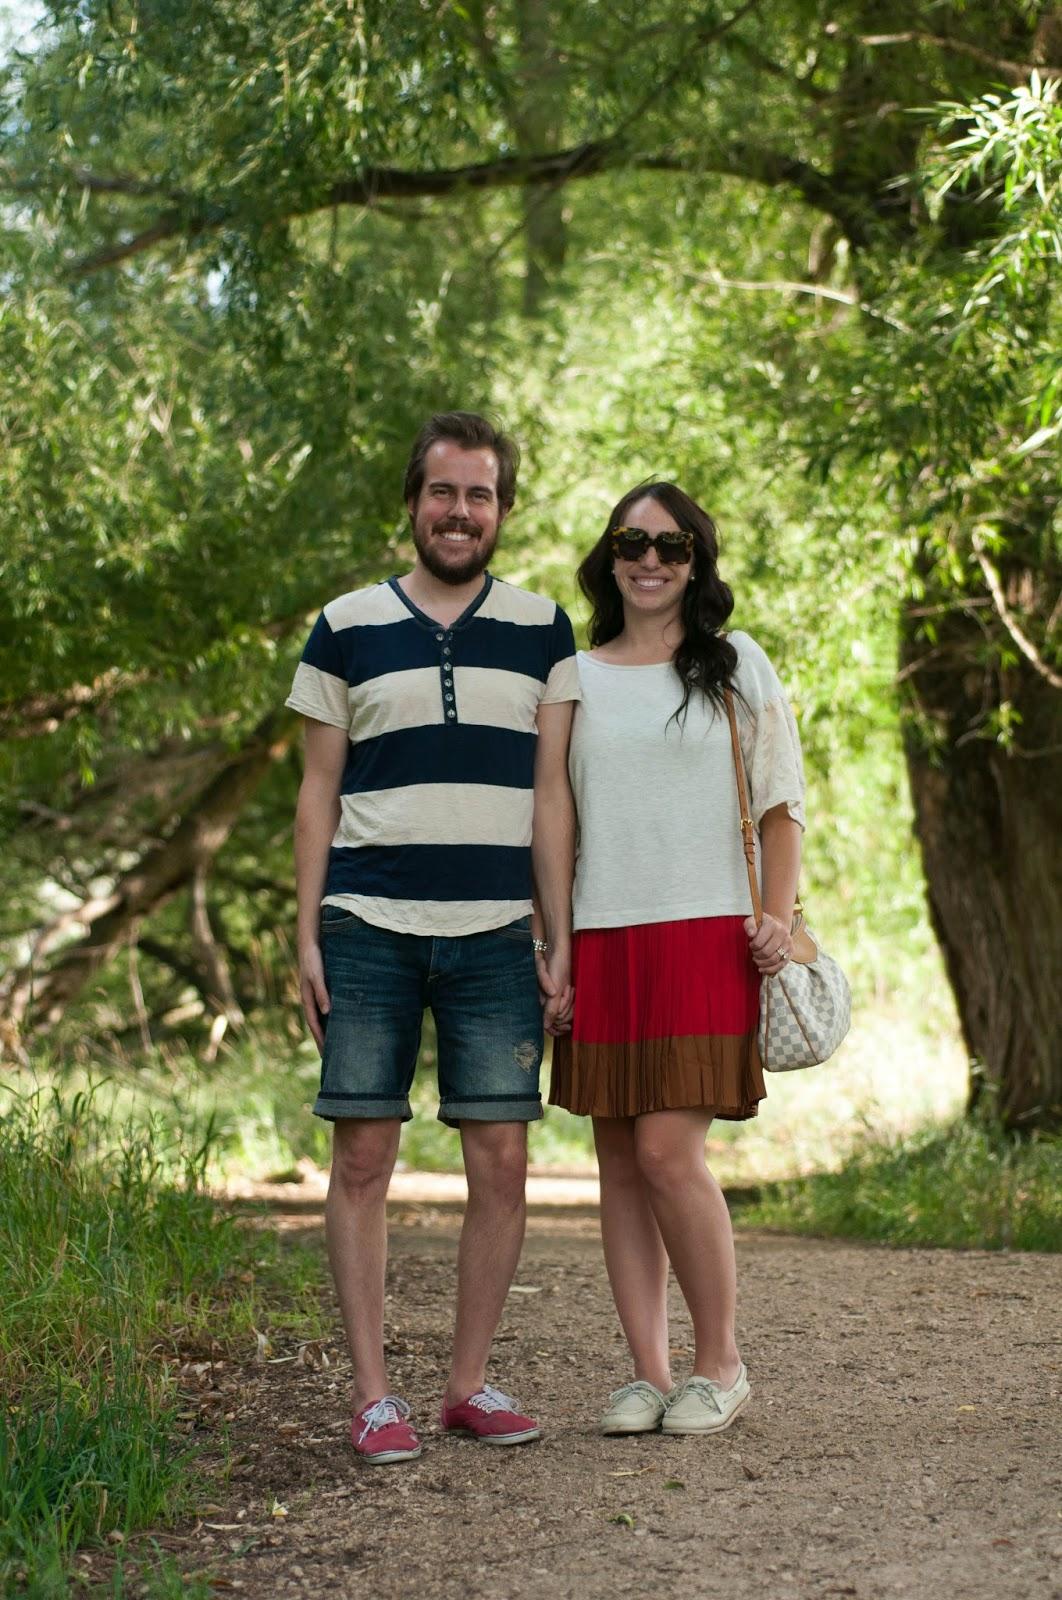 couple fashion, couples style, street style, anthropologie ootd, karen walker tortoise sunglasses, mens ootd